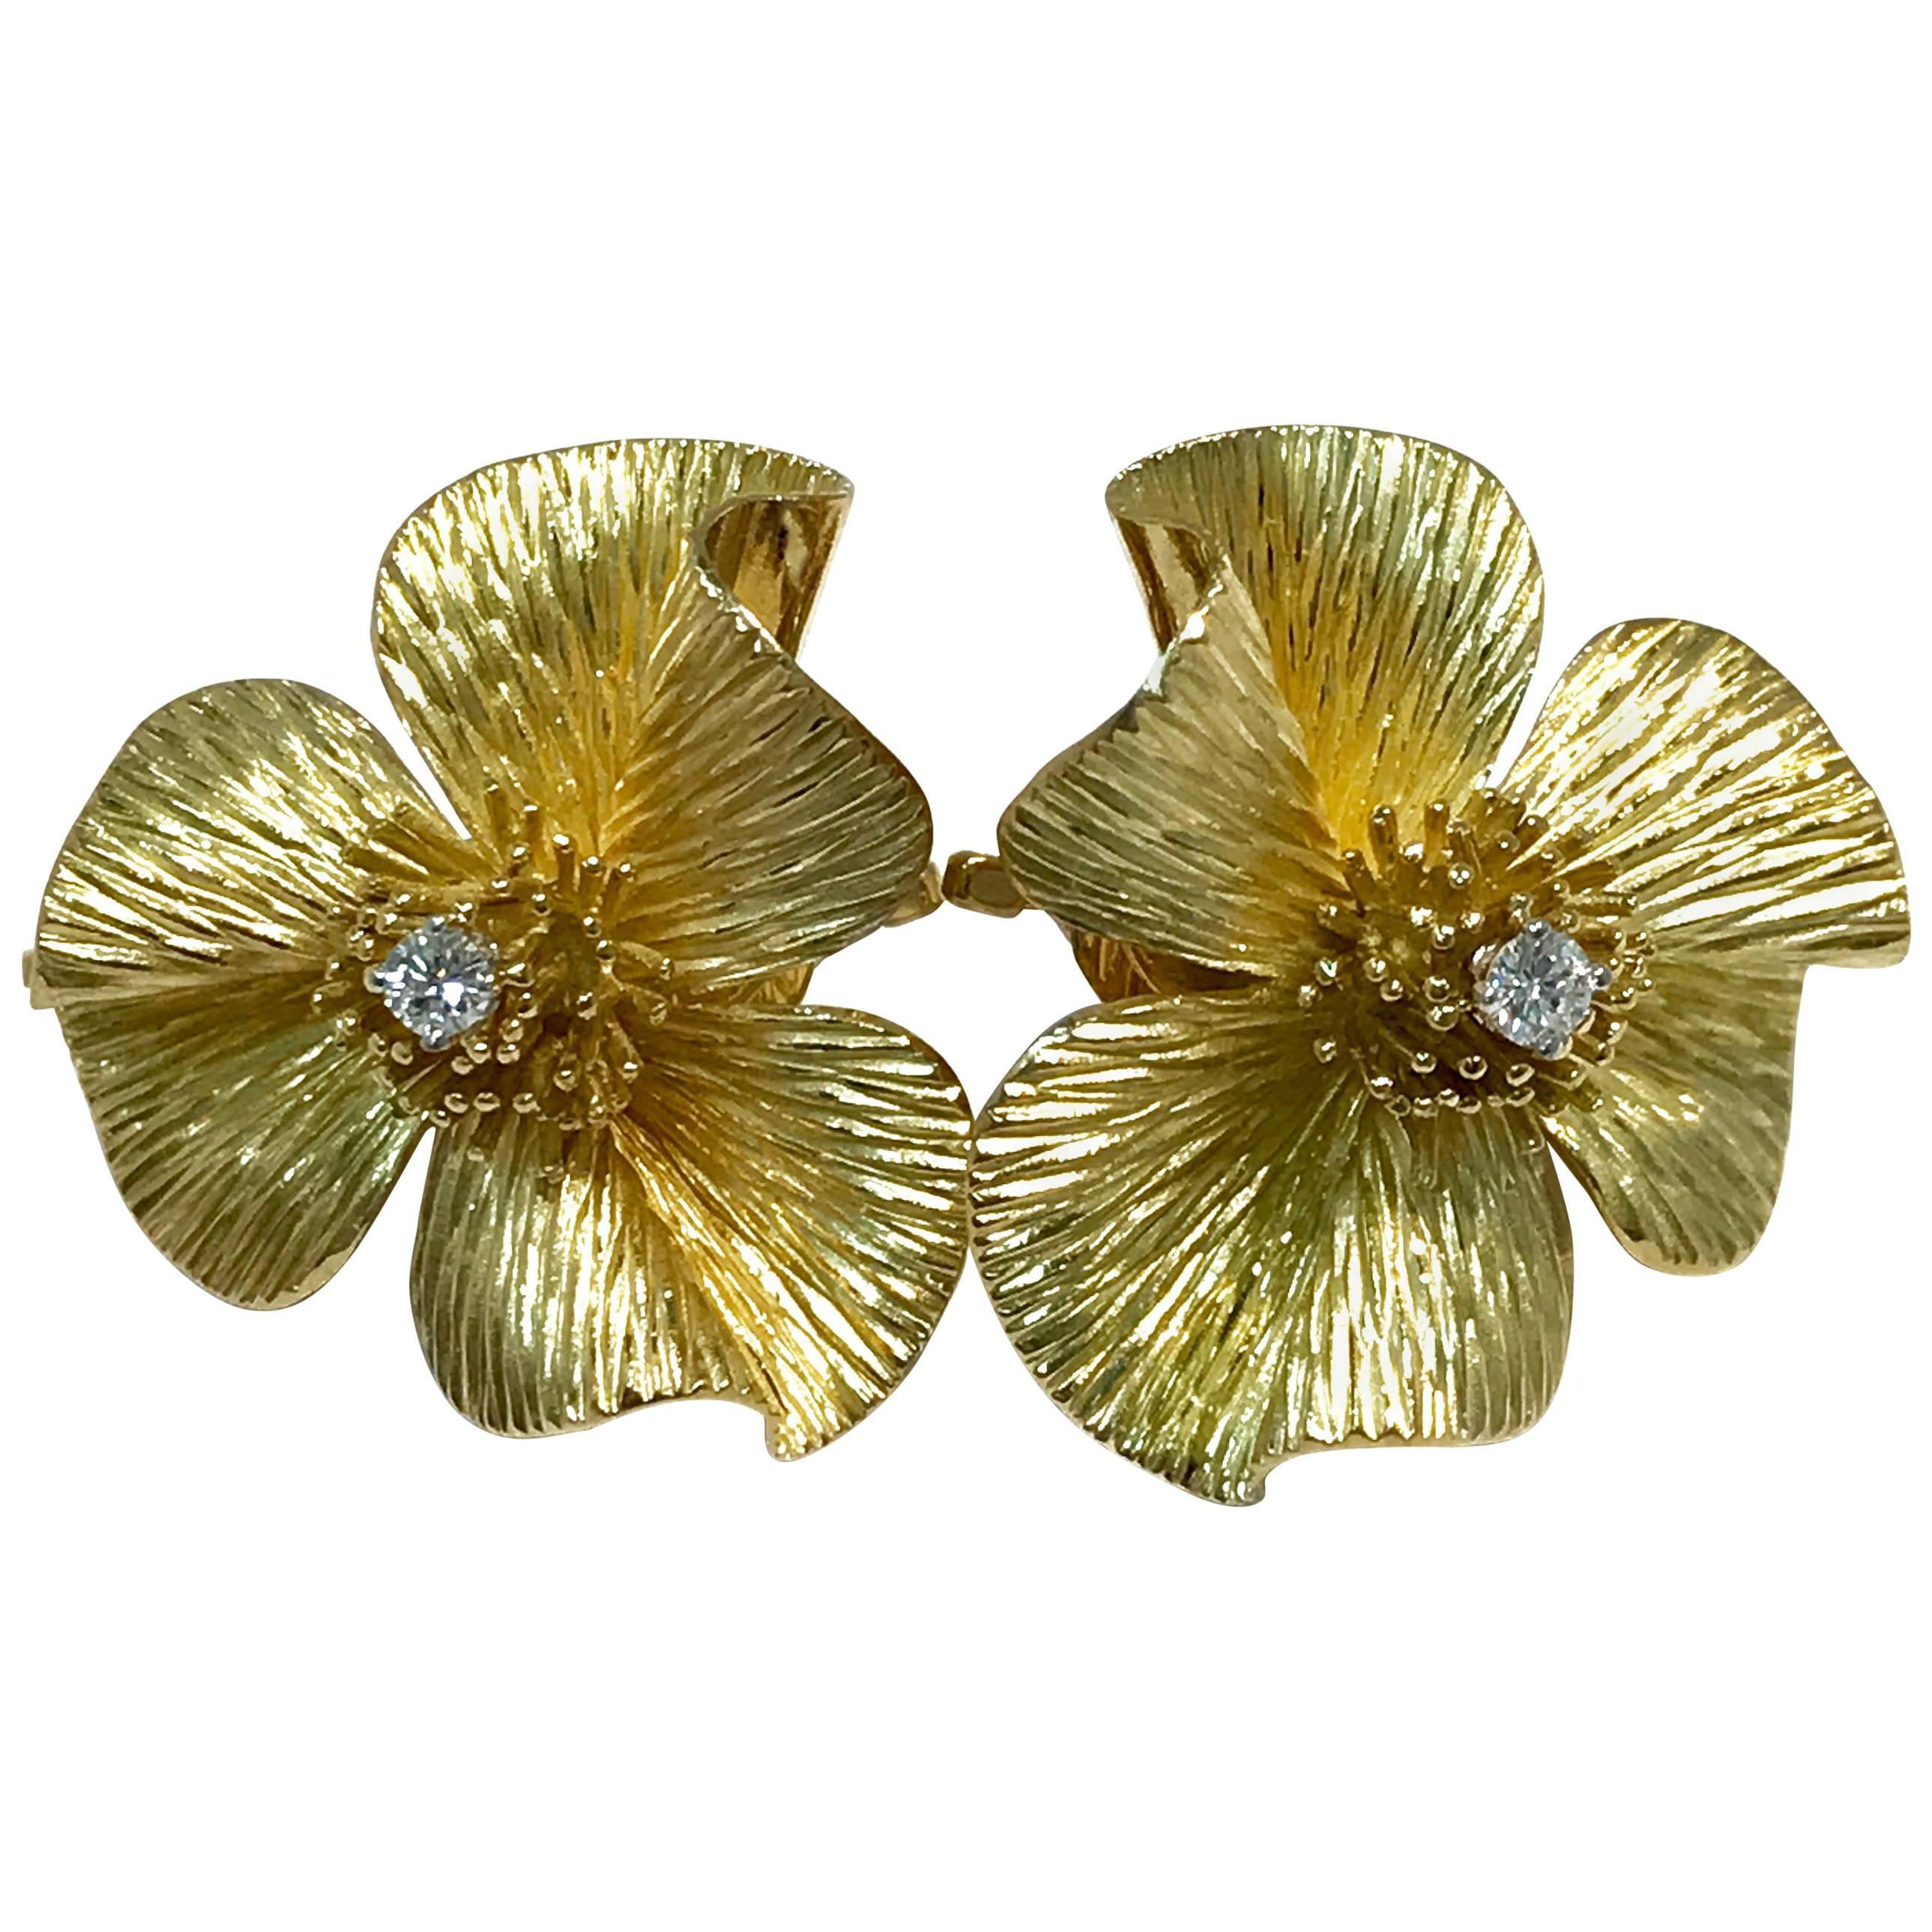 Retro/Vintage Gold Flower Diamond Earrings, circa 1950s